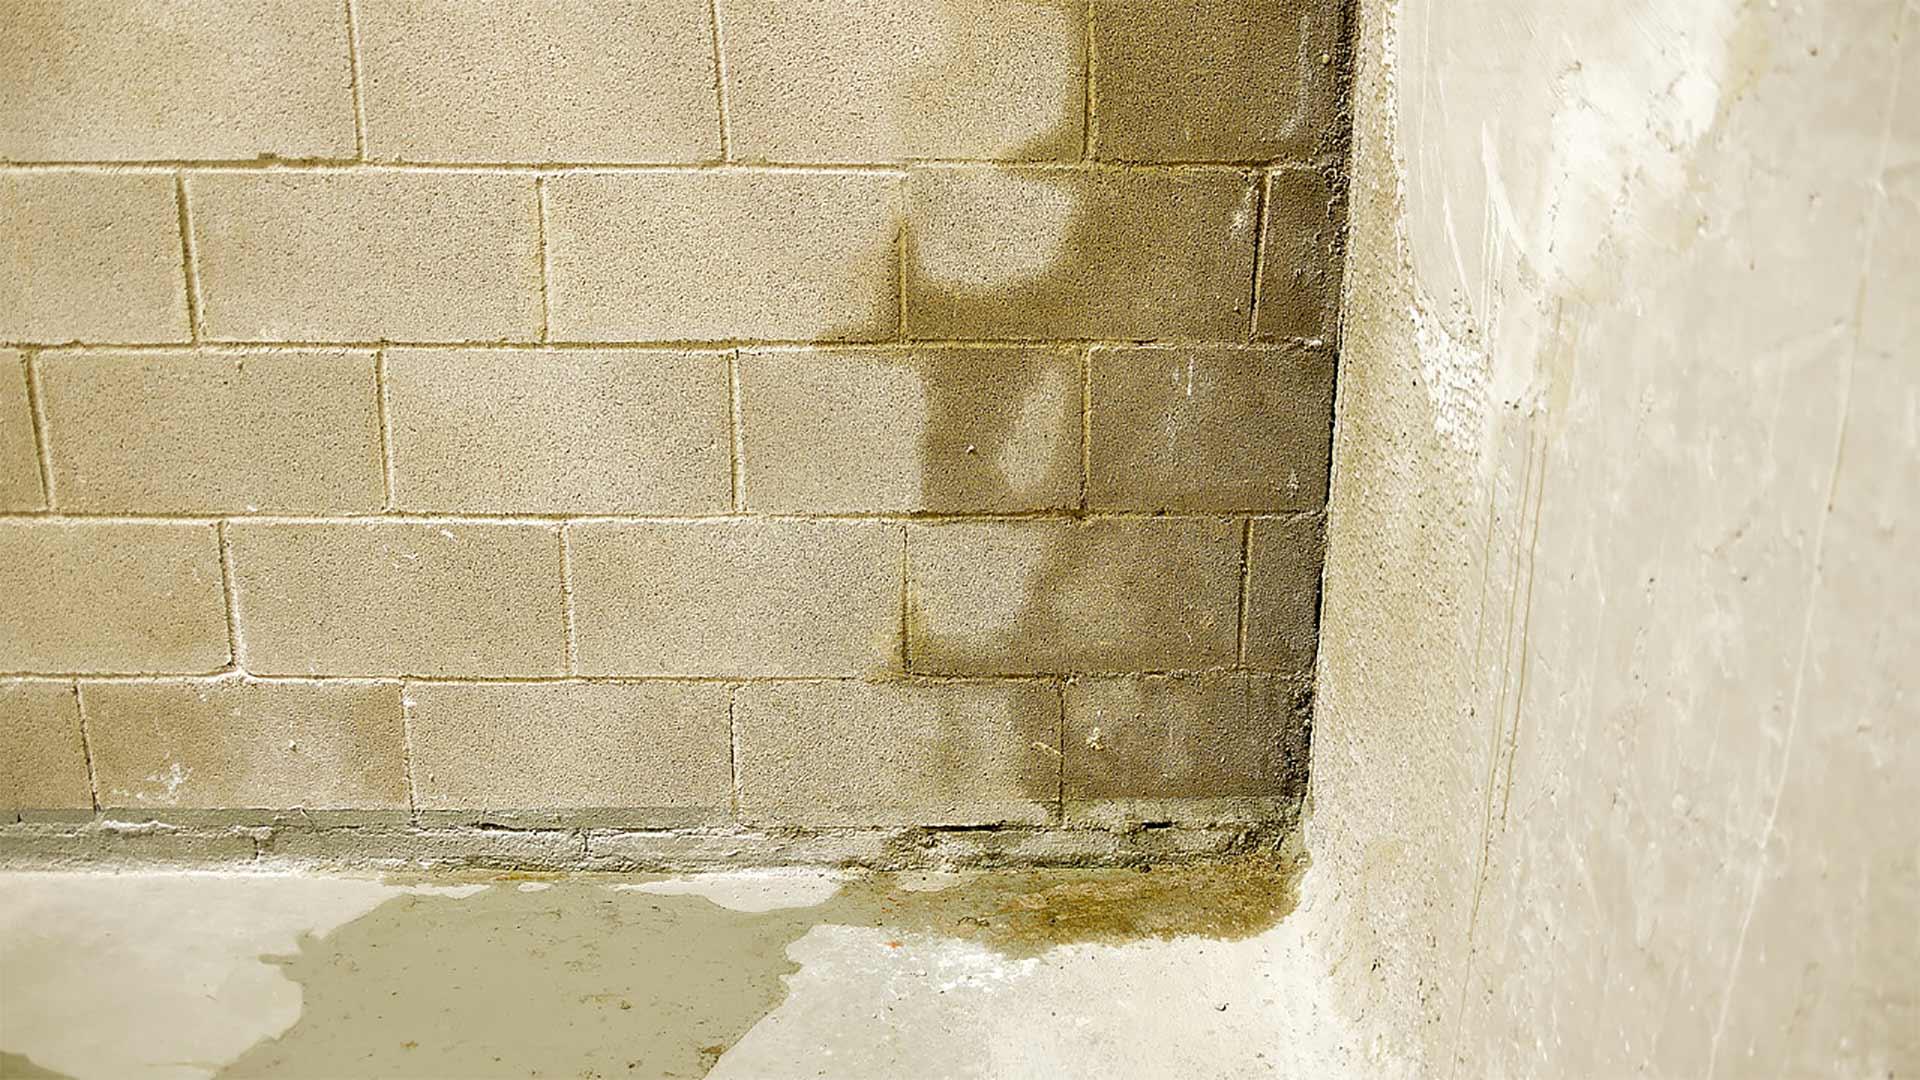 Water damaging a basement